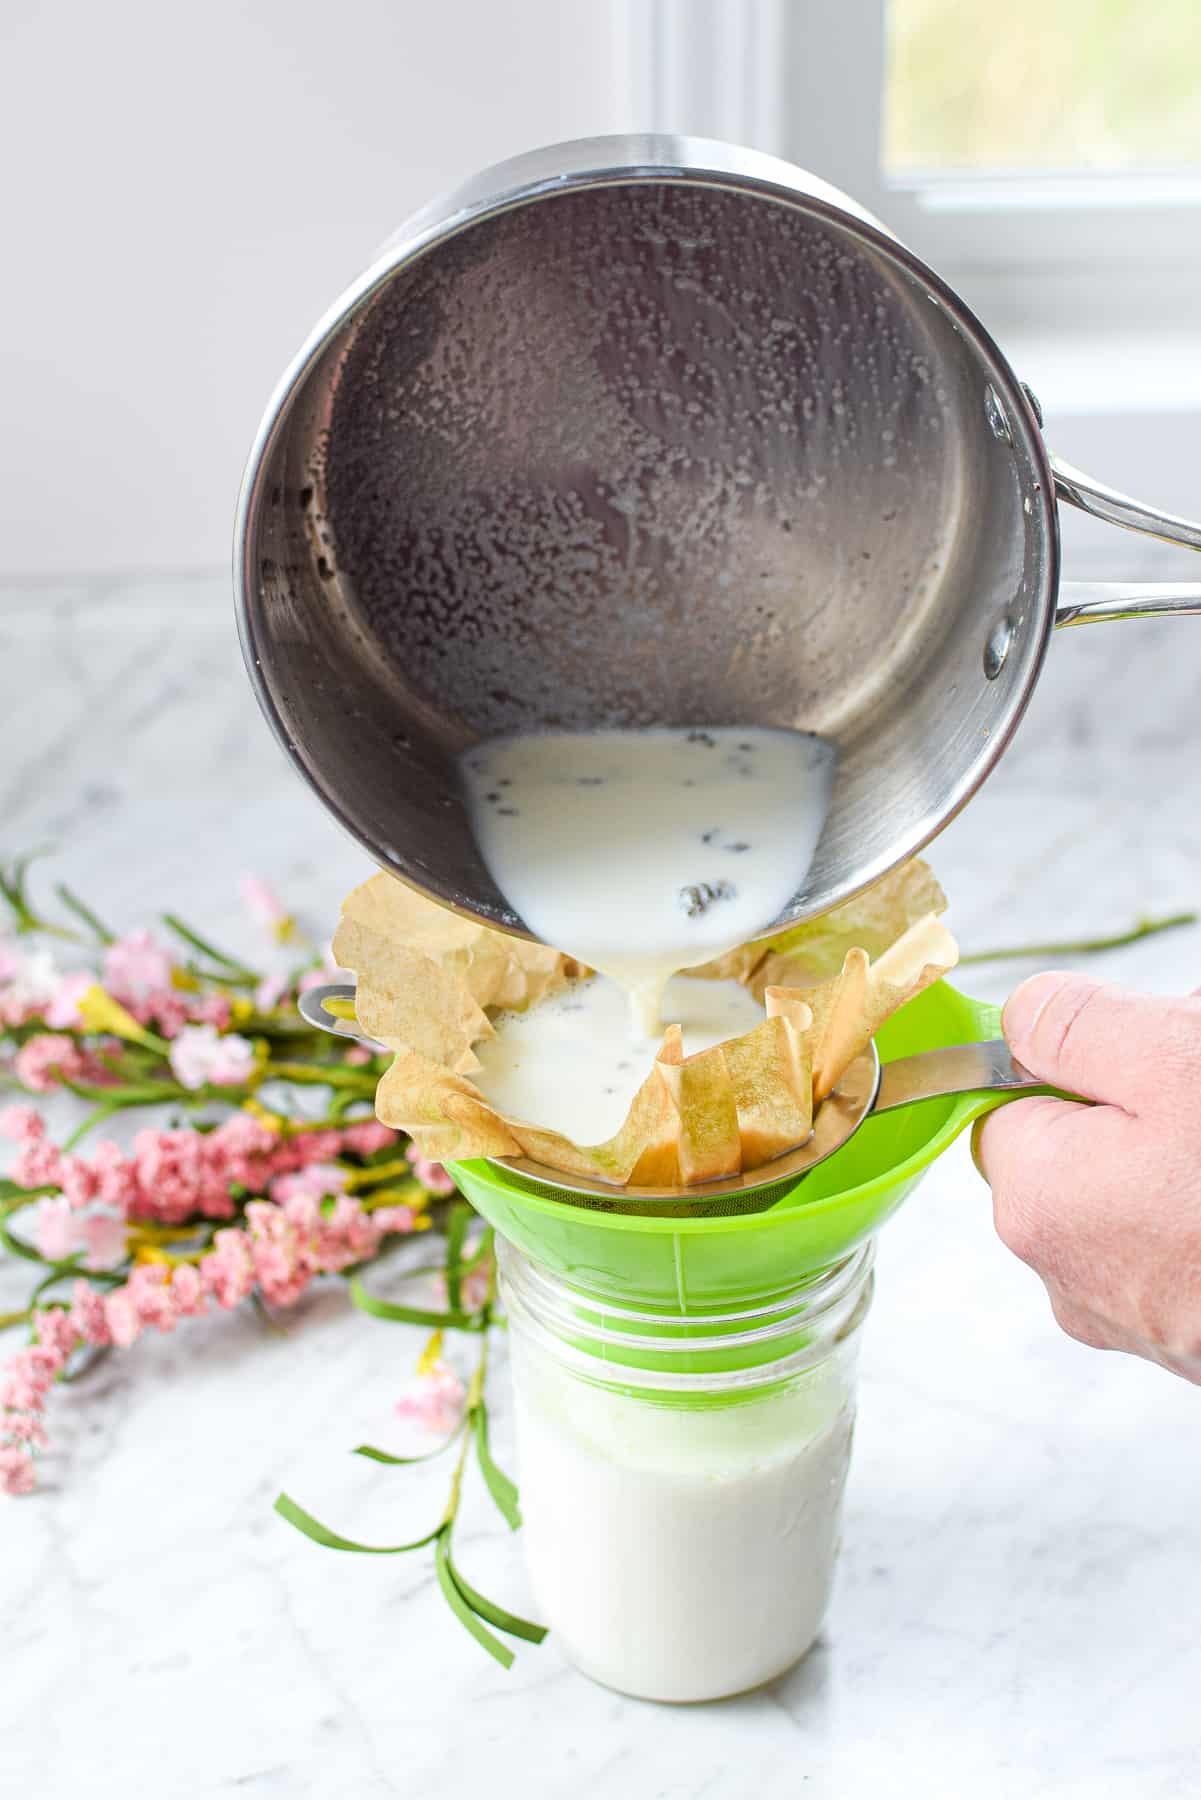 Straining Cannabis Milk or Cream